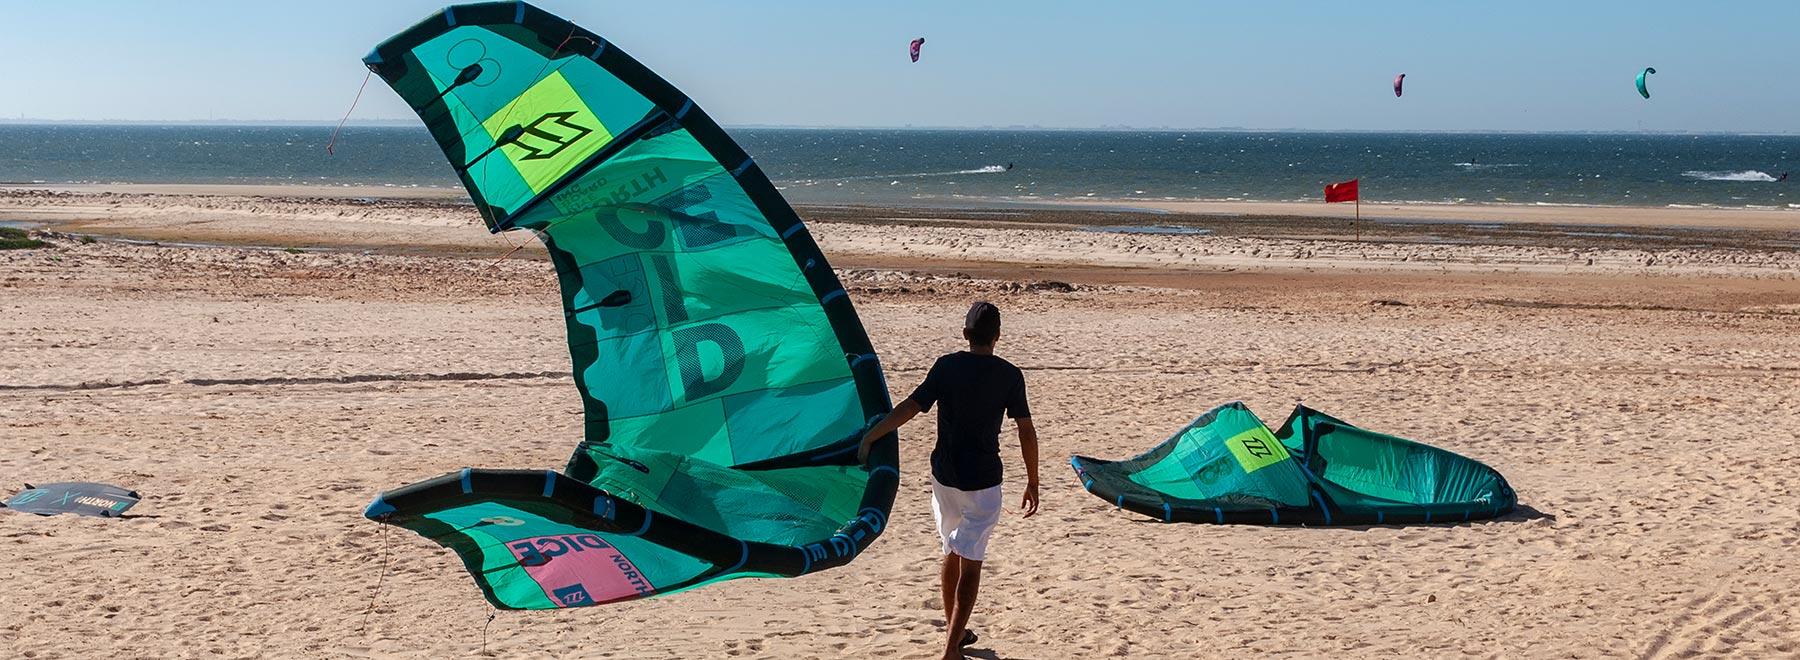 Kitesurfen lernen in Dakhla OceanAcademy